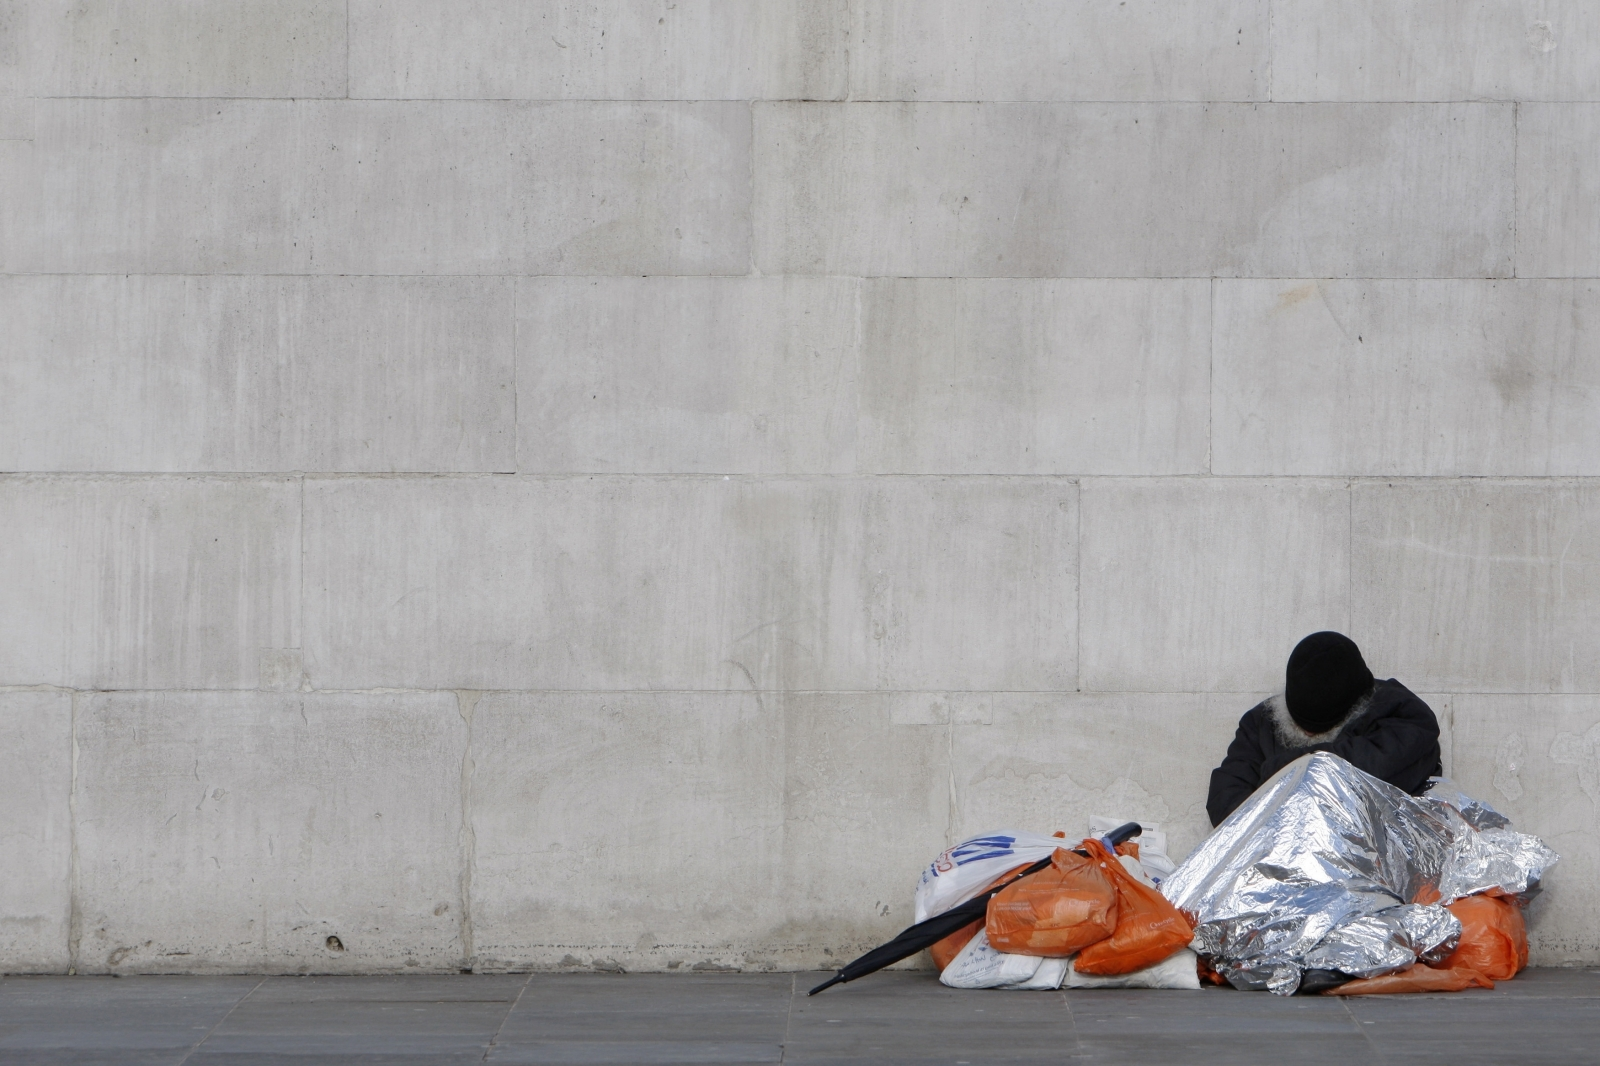 homeless person sleeps on street